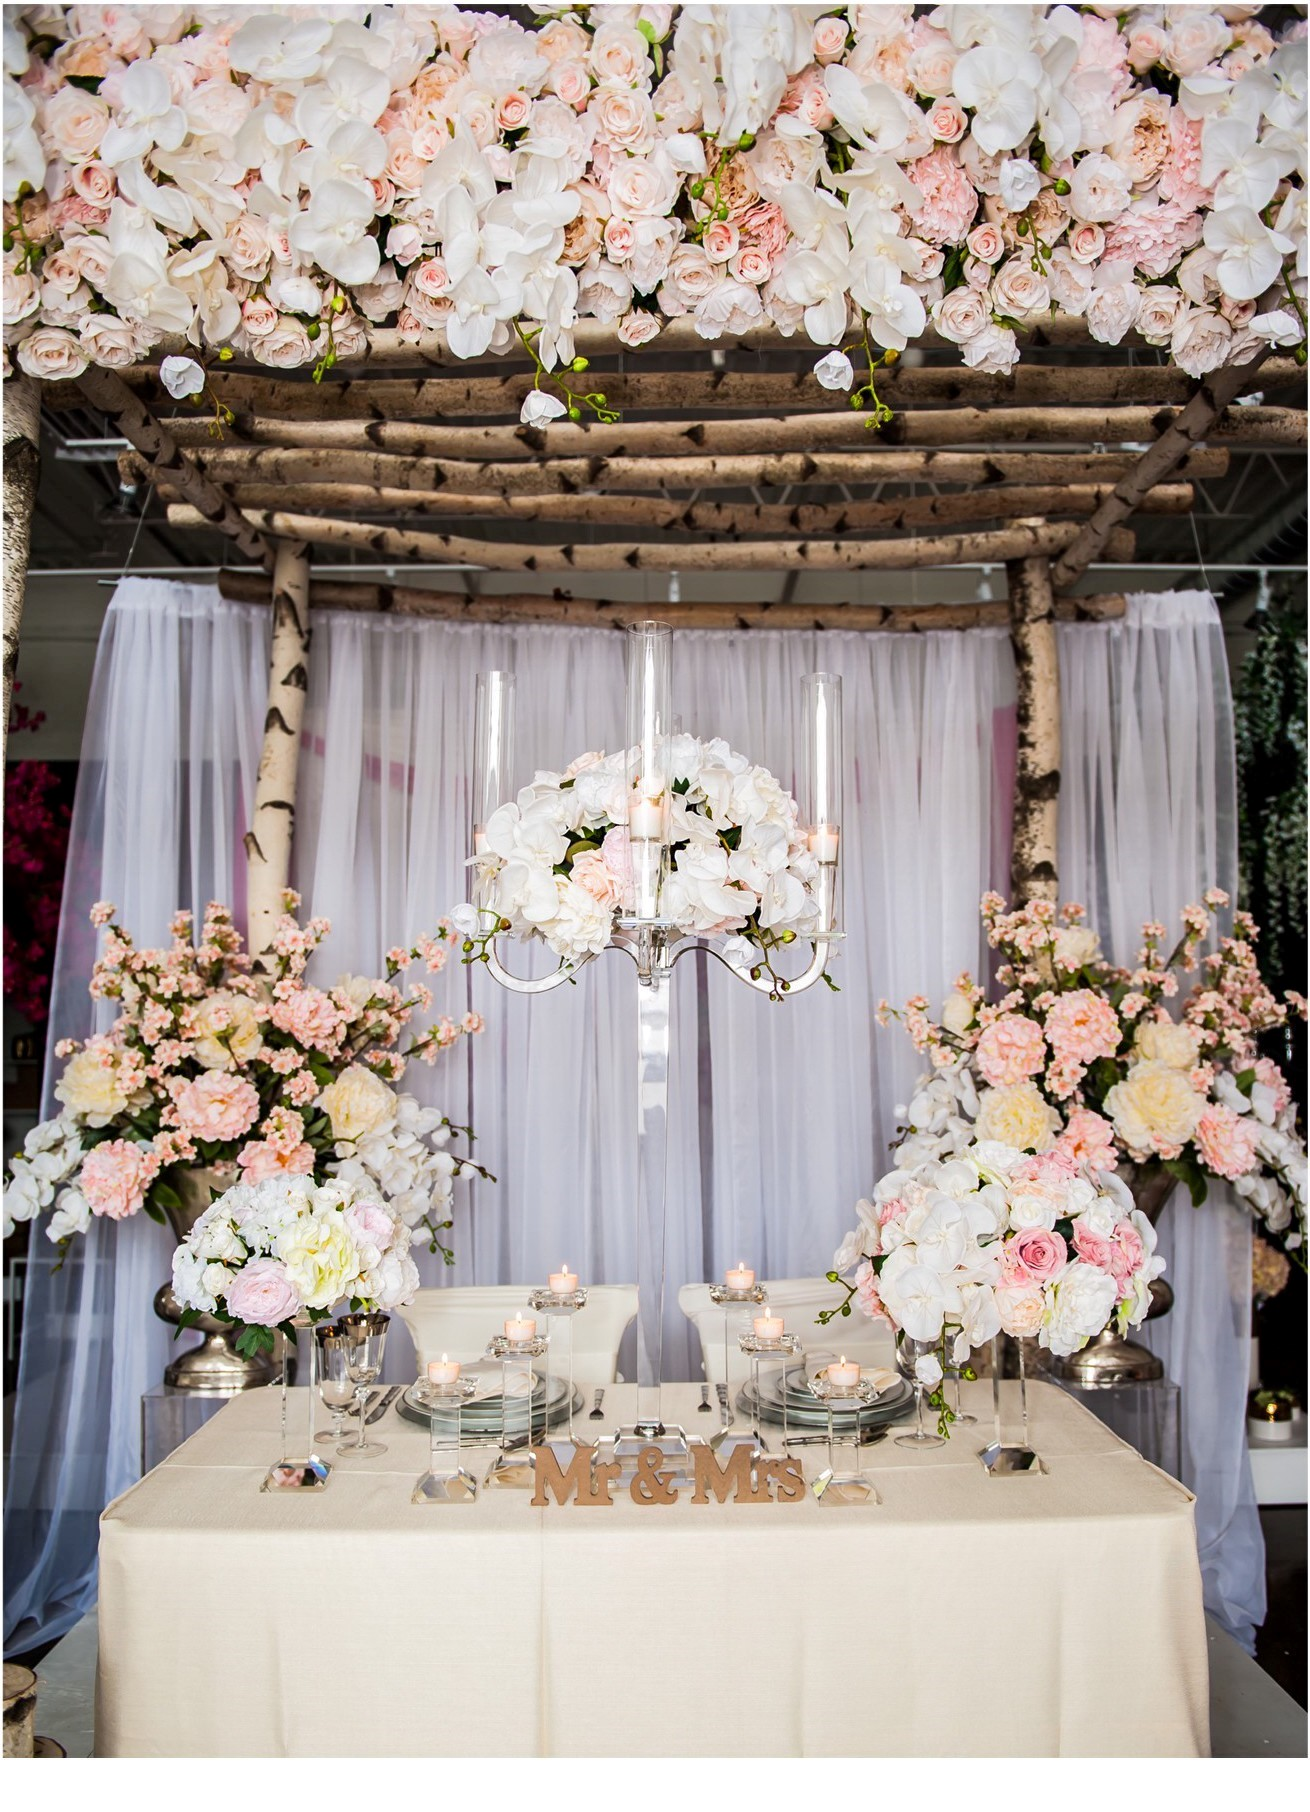 73 decorsimple wedding decor rentals vancouver amazing home design simple and wedding decor - Home decor rental collection ...